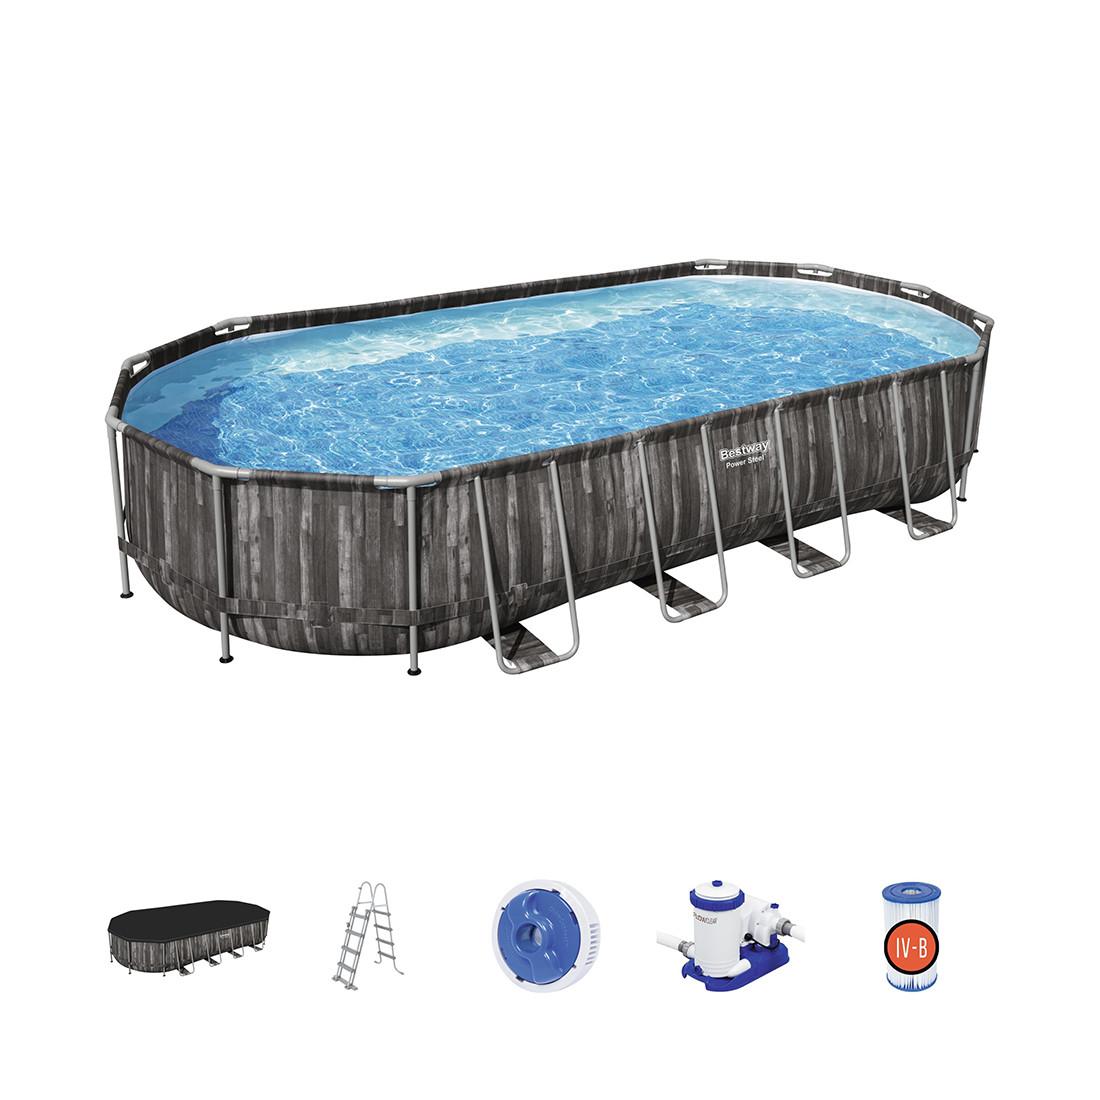 Каркасный бассейн Power Steel 671 х 132 см, BESTWAY, 56889